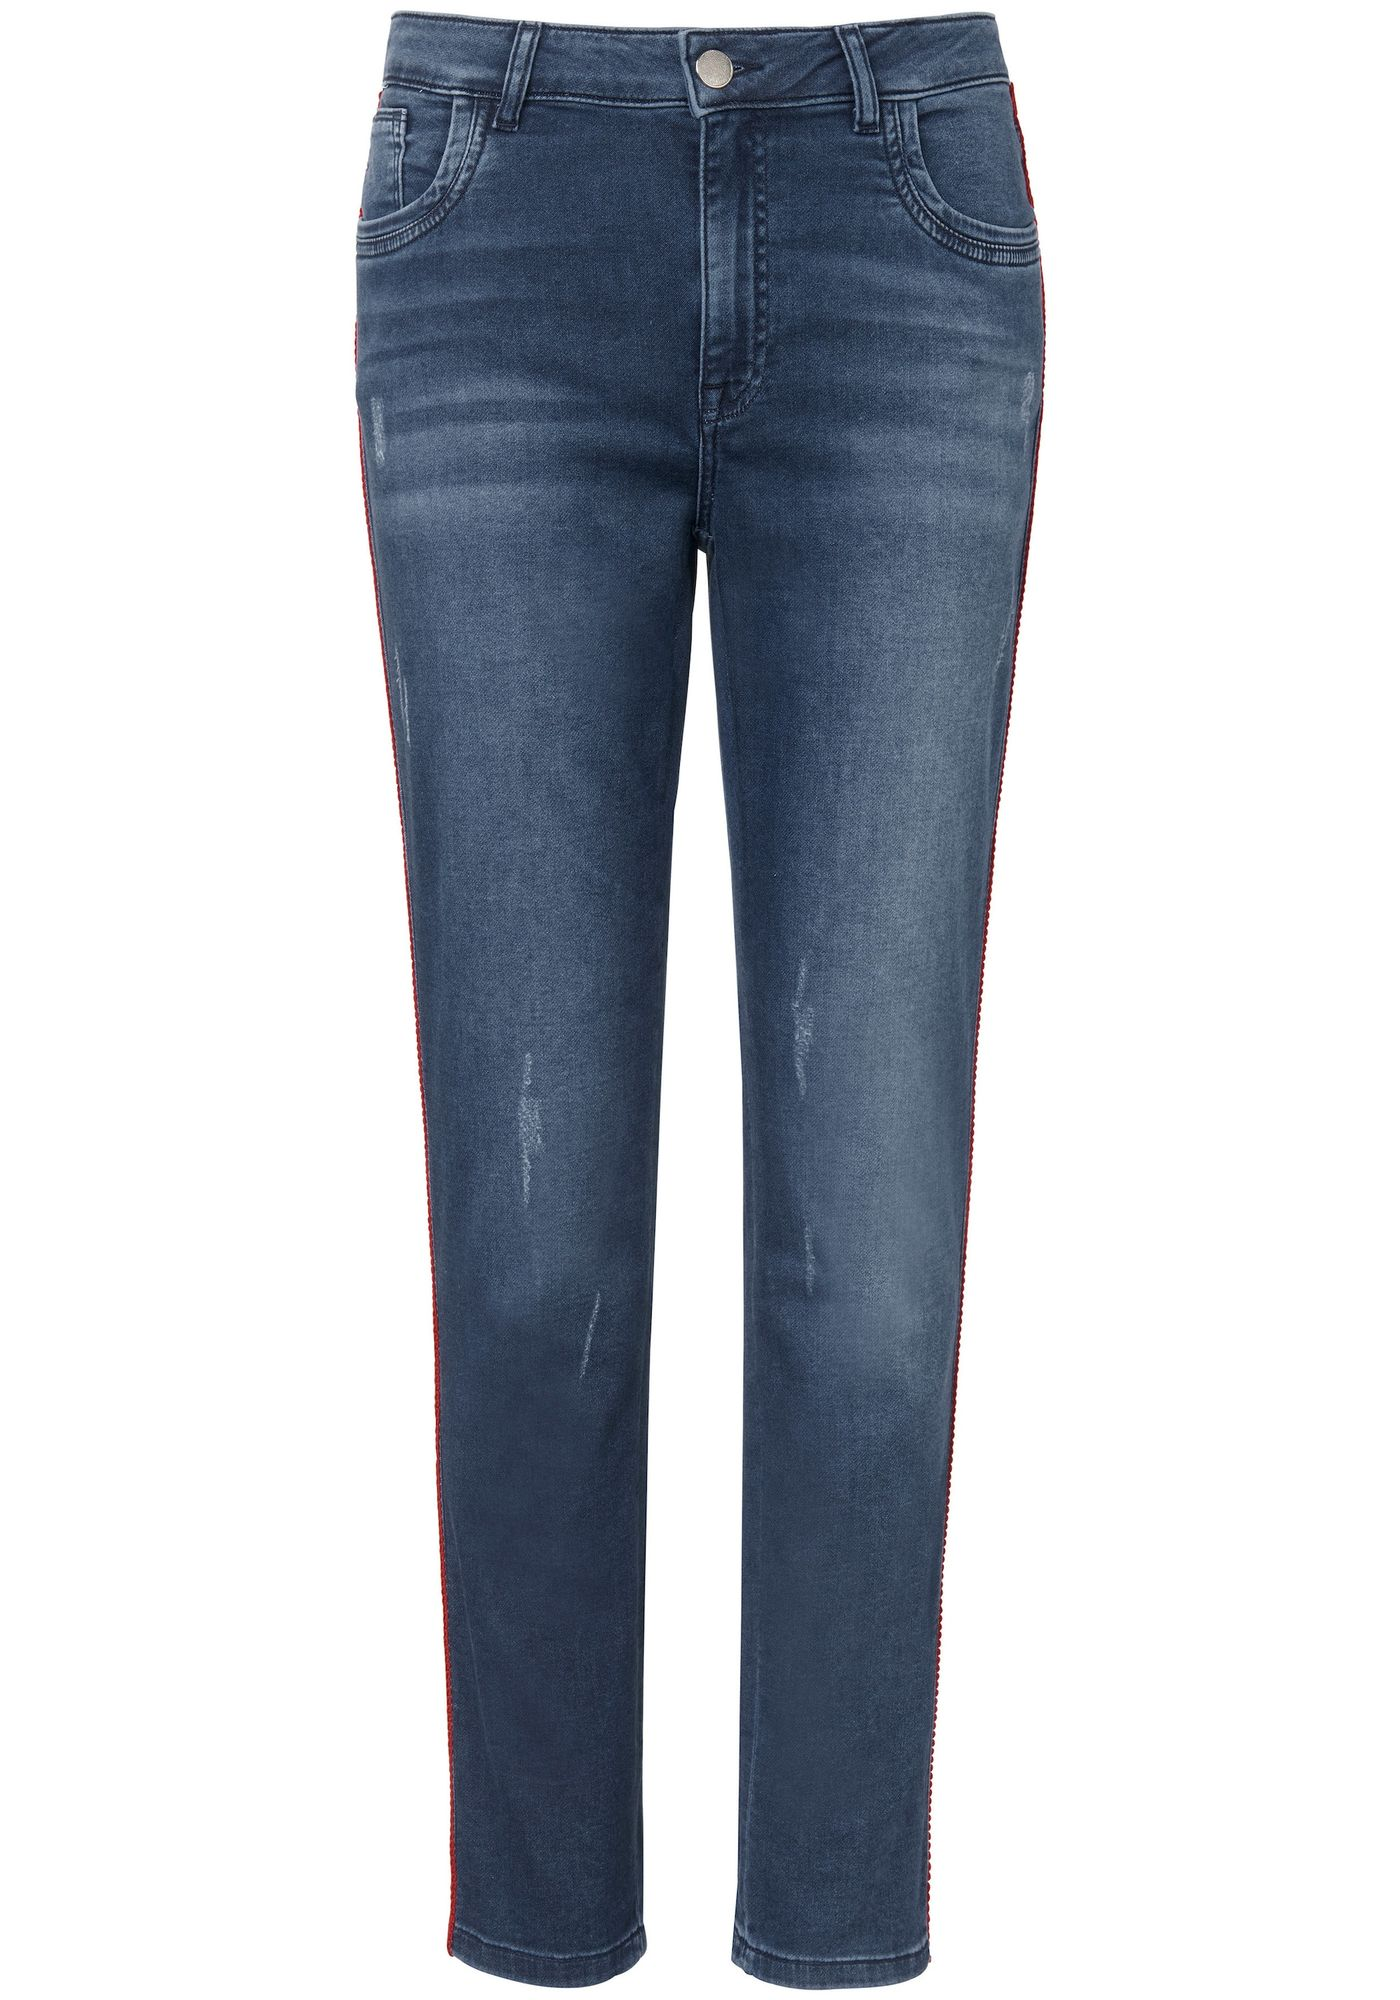 Jersey-Jeans in 5-Pocket-Form